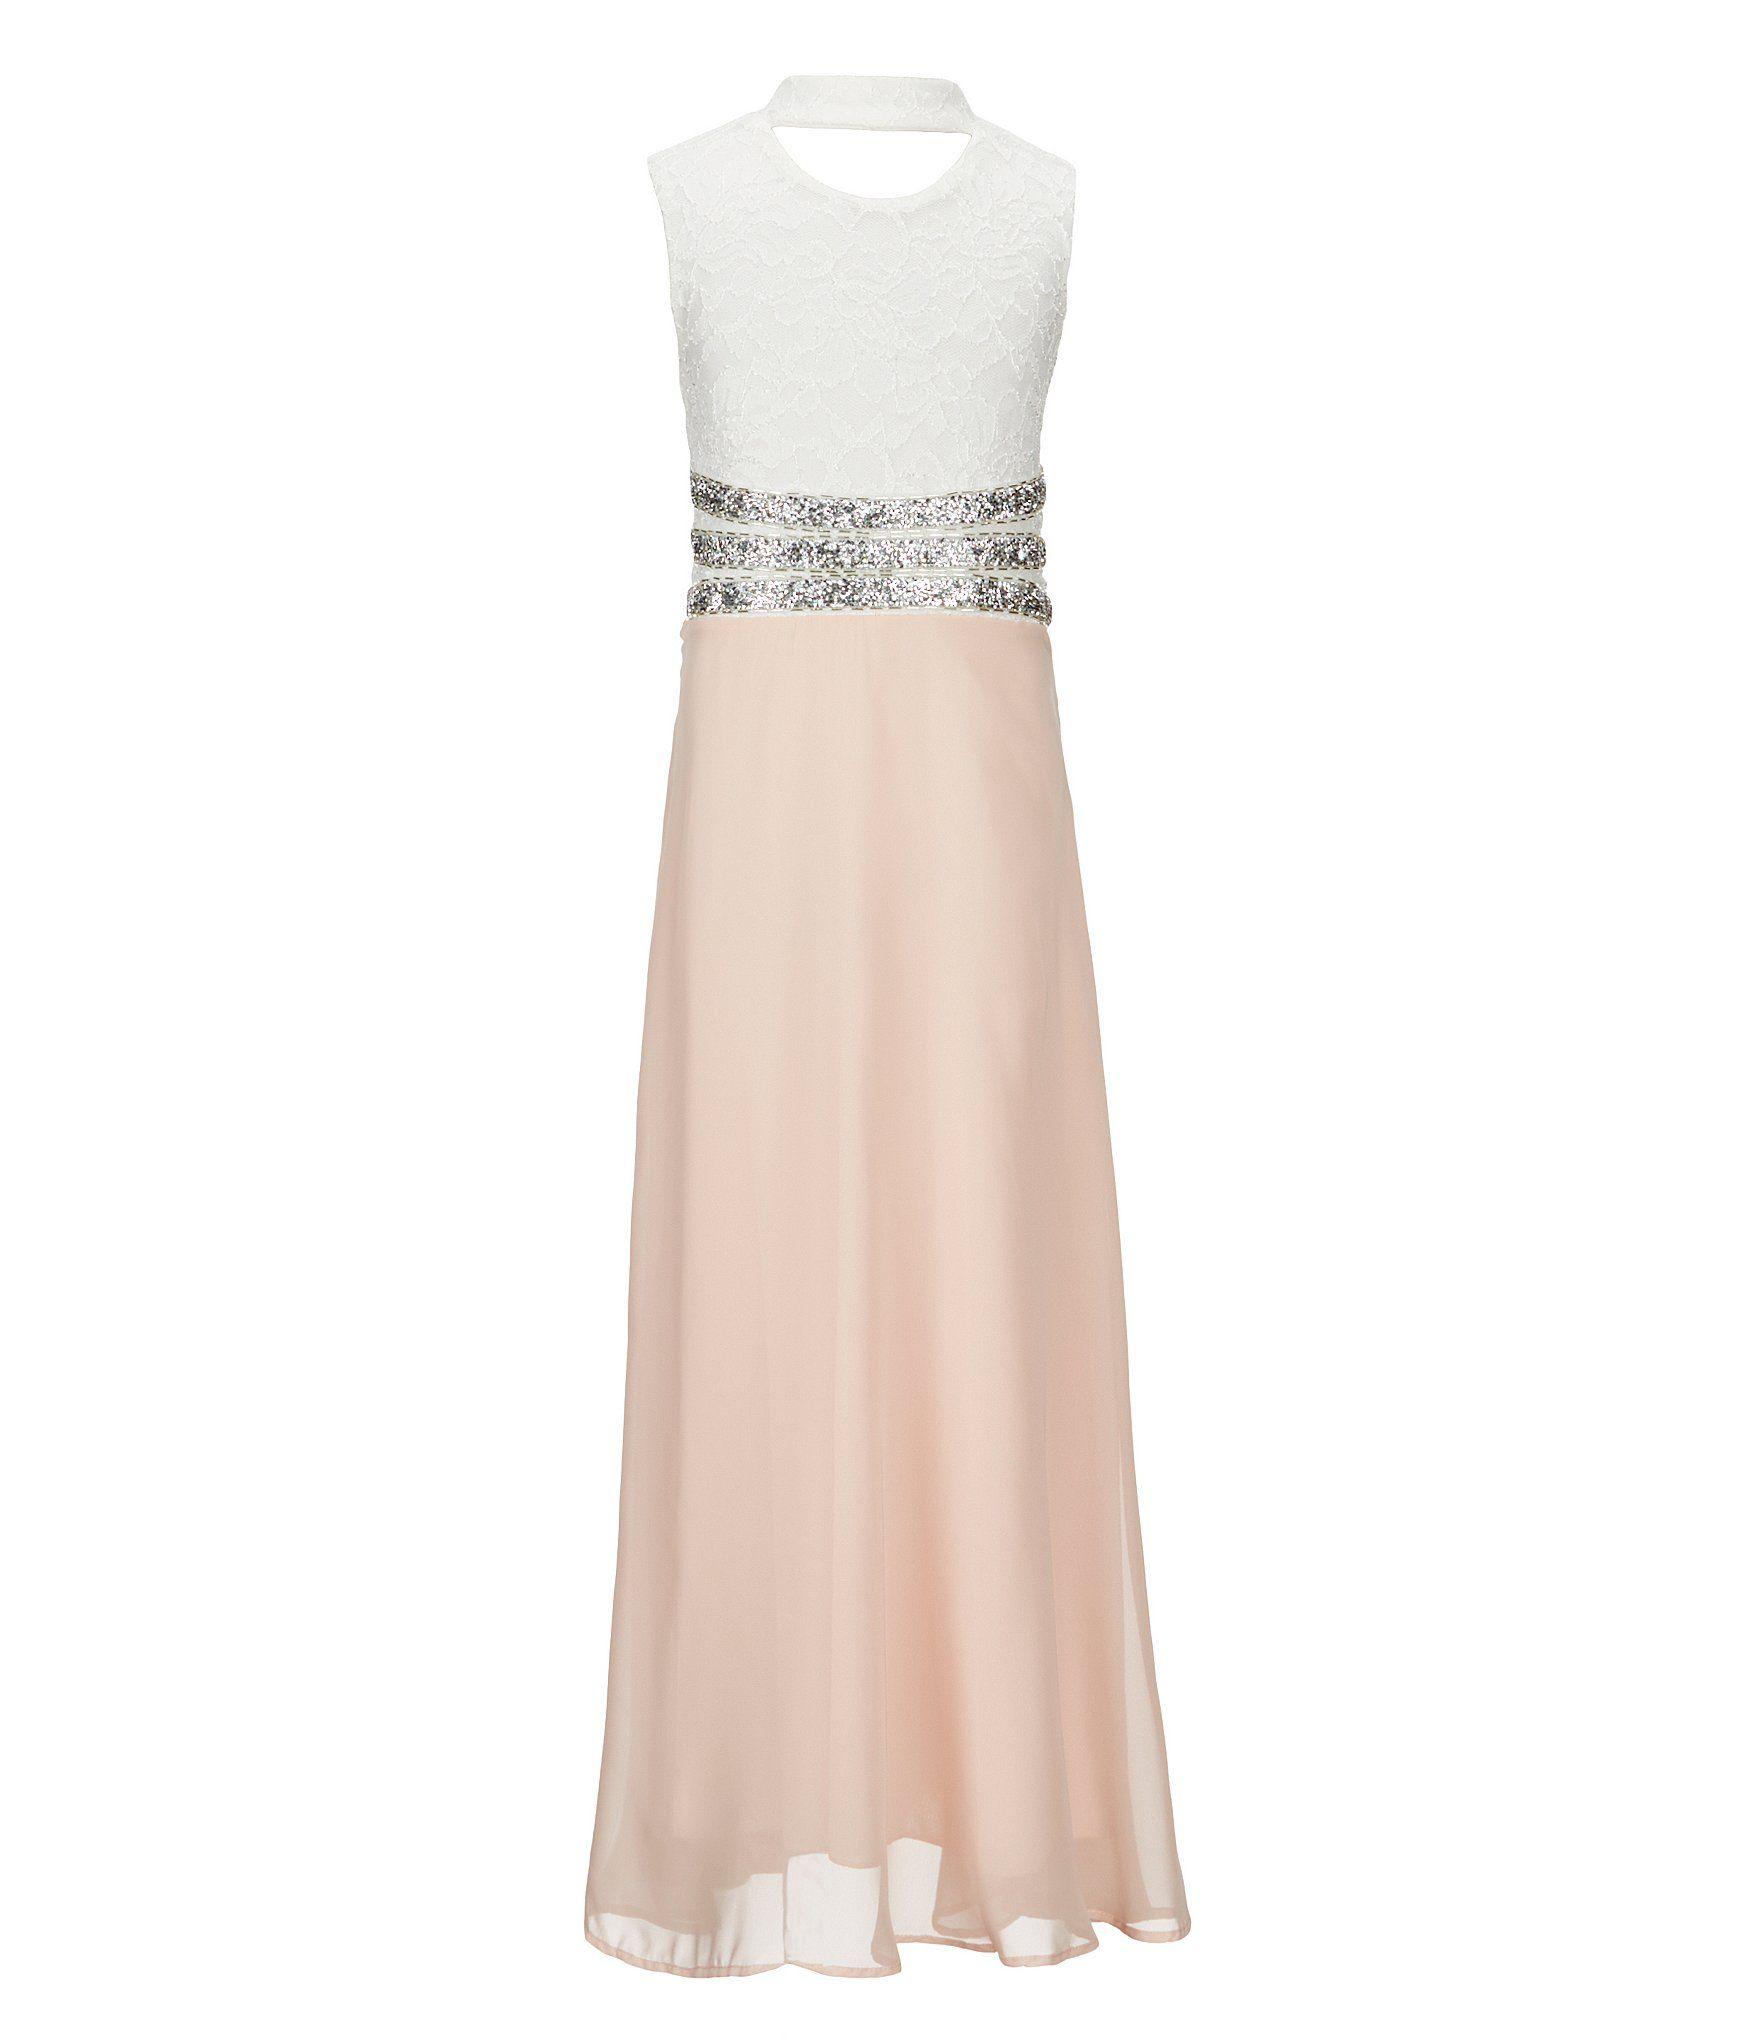 Xtraordinary big girls lace rhinestonewaist dress wedding